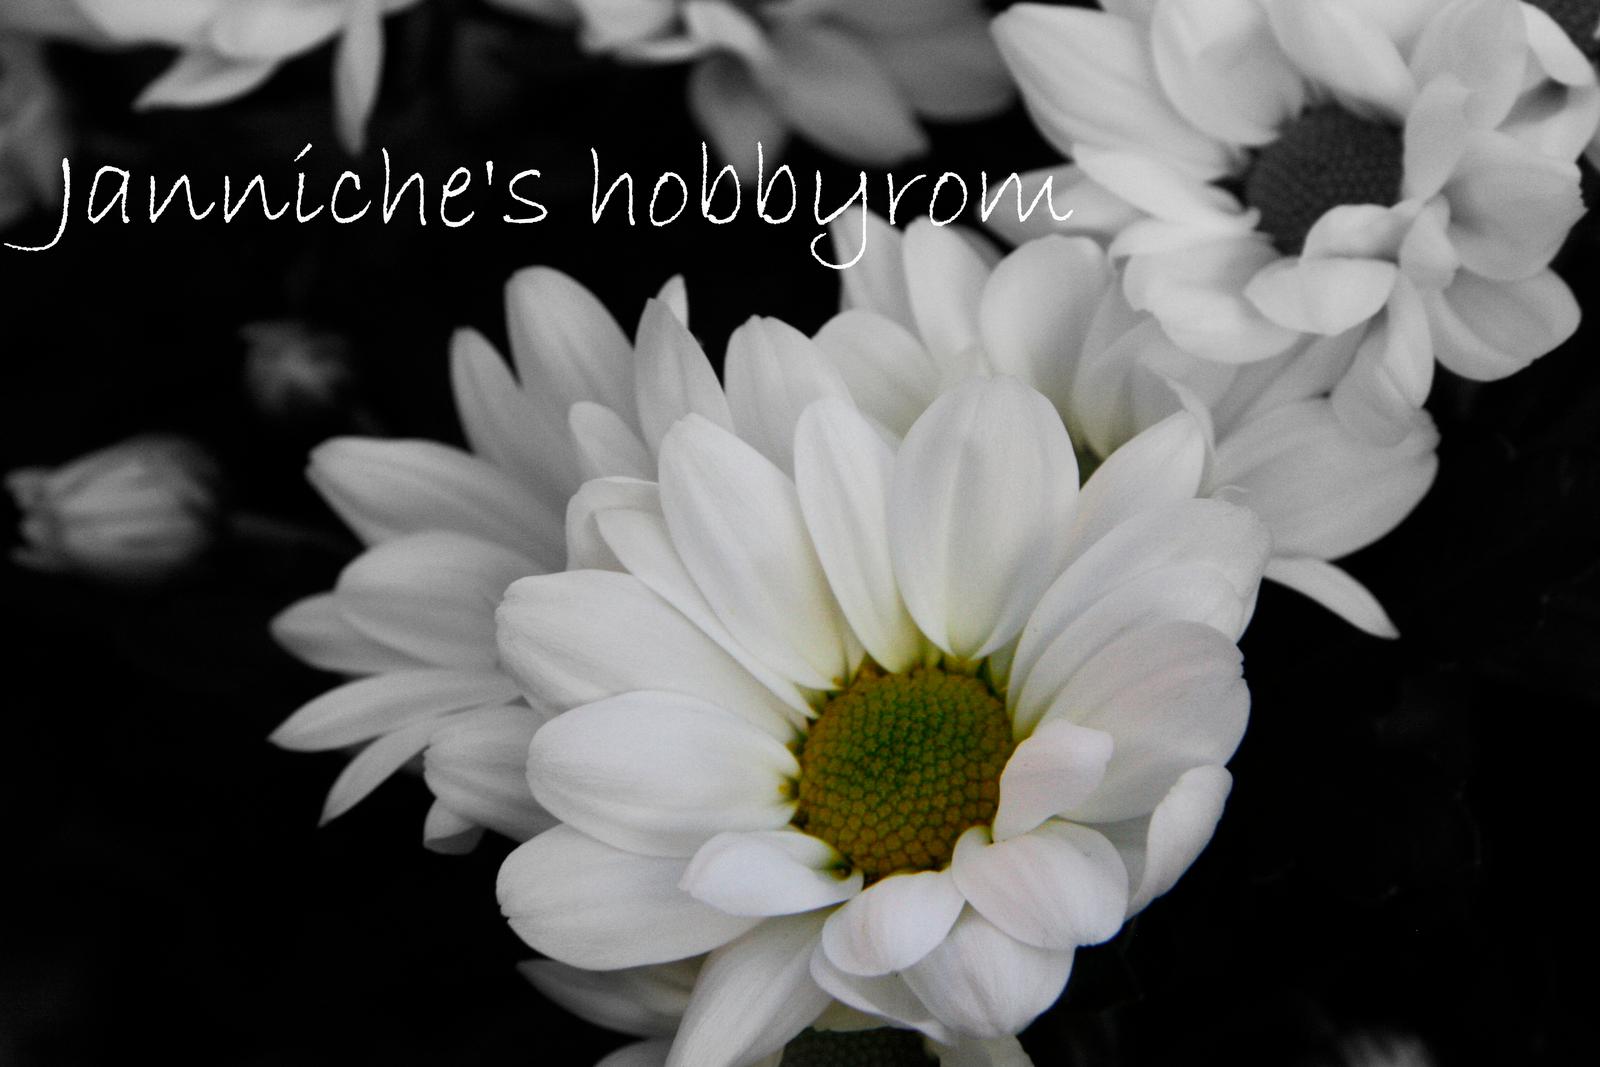 Janniche's hobbyrom